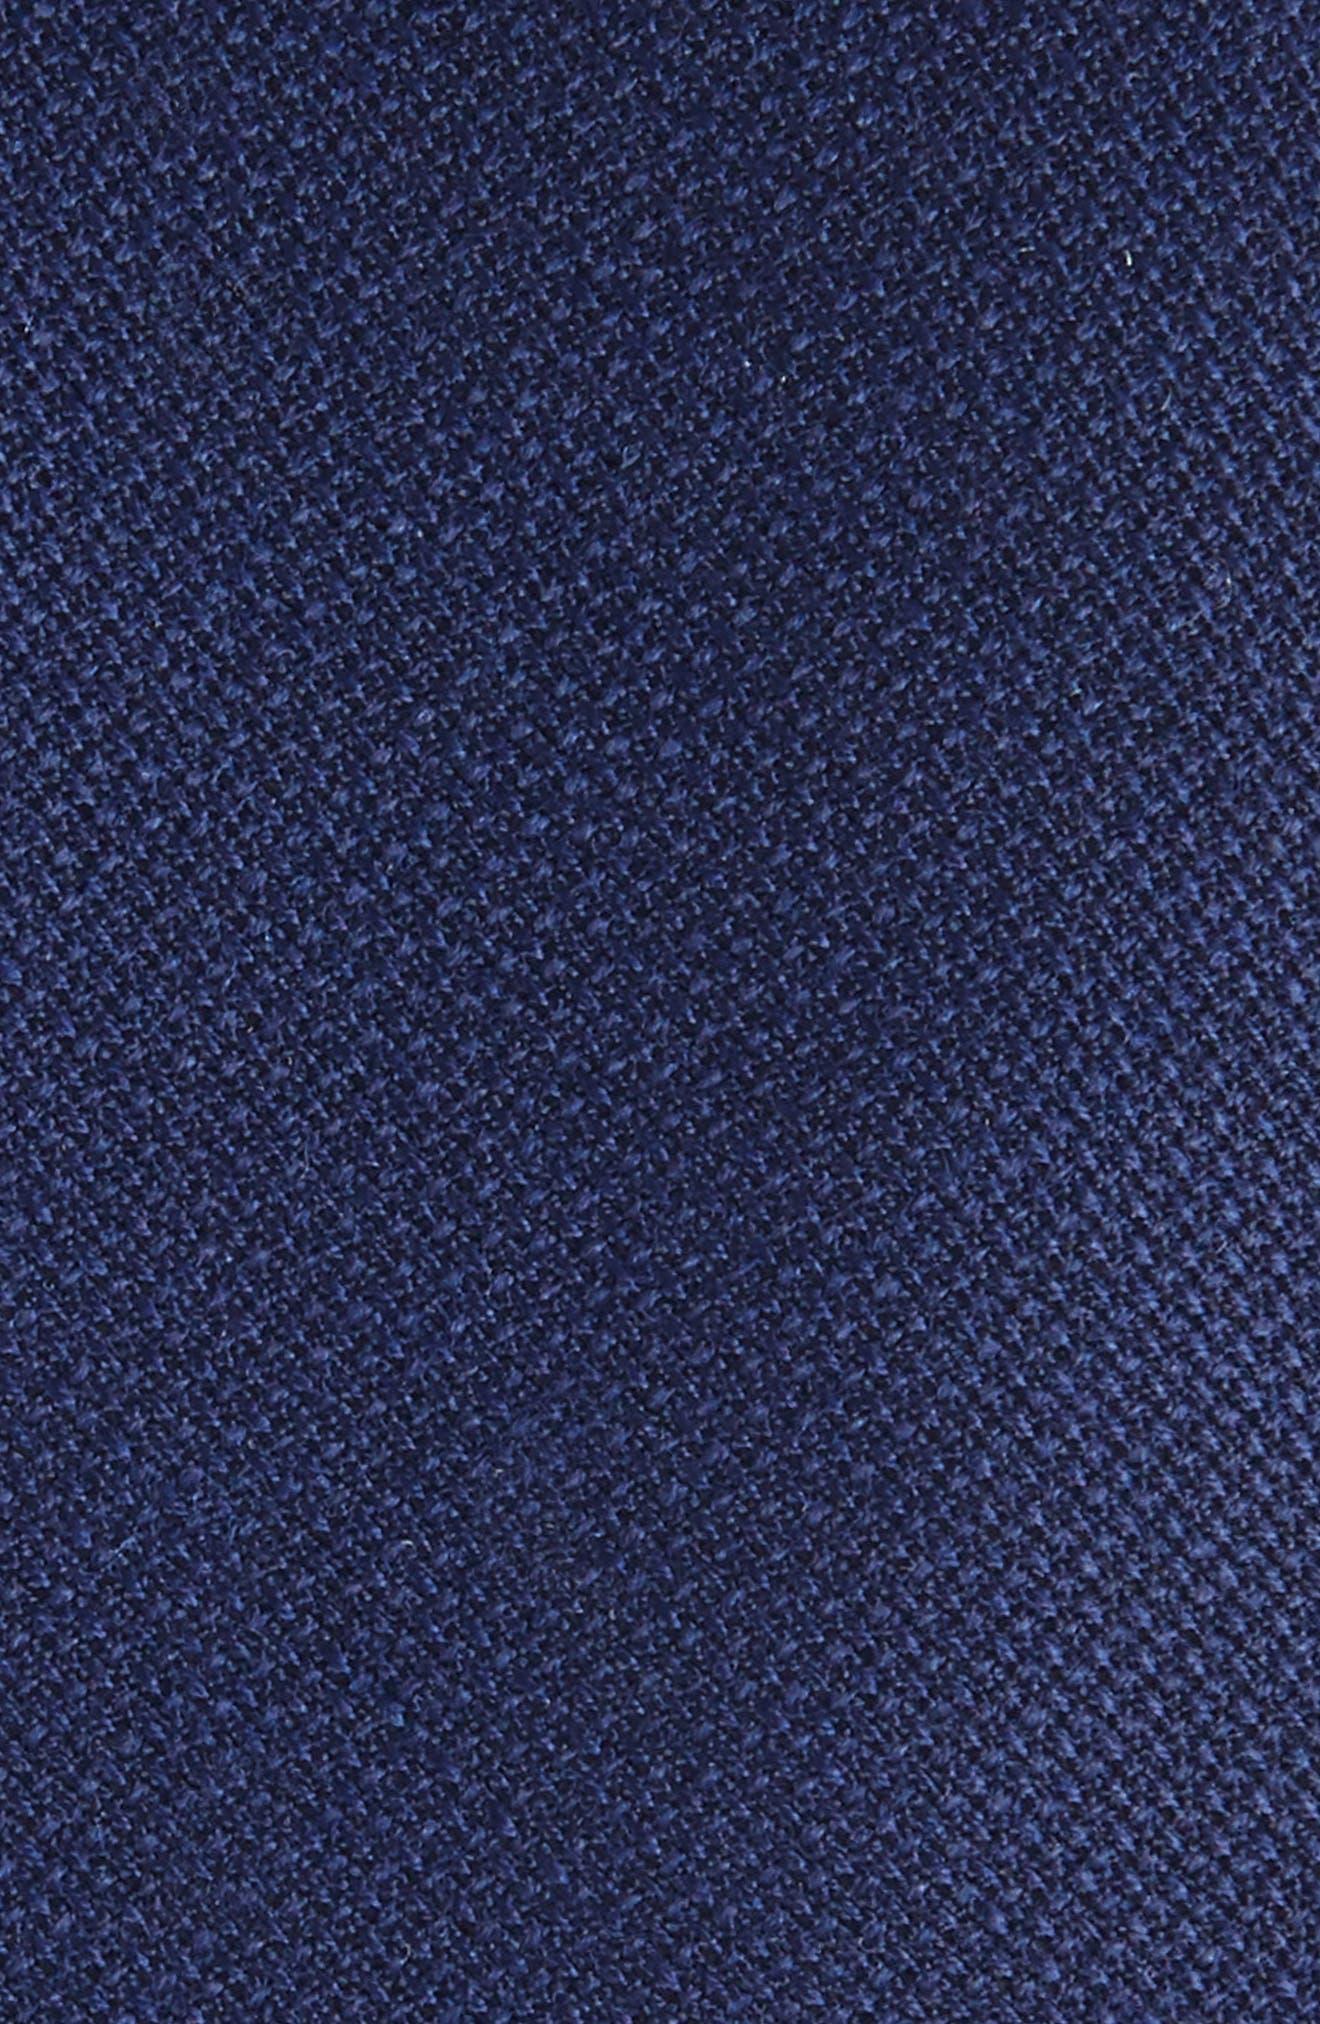 Alternate Image 2  - Eleventy Marled Wool Skinny Tie